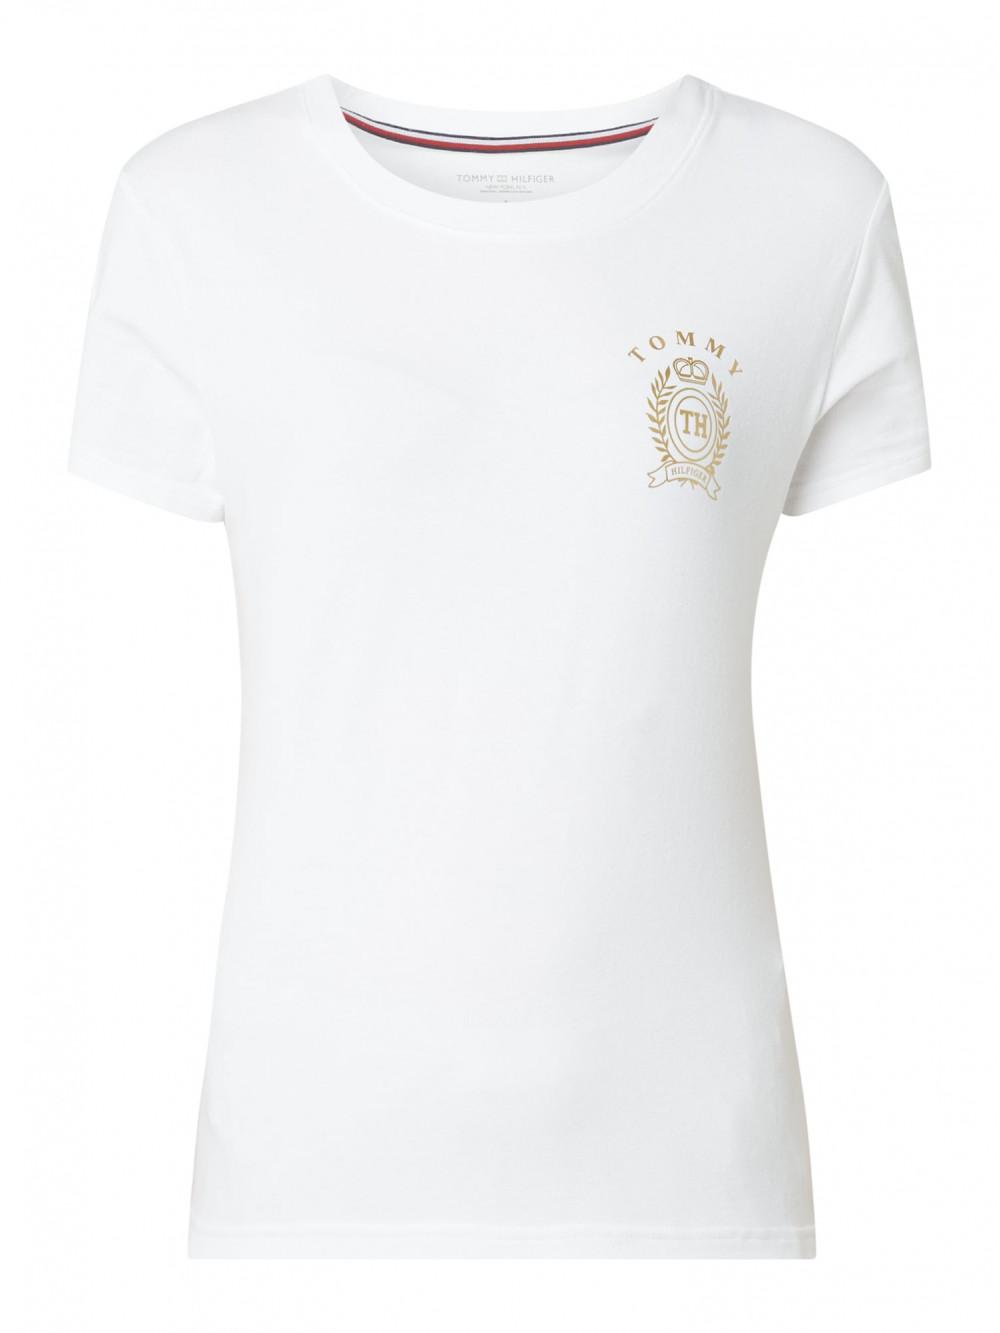 Dámske tričko Tommy Hilfiger CN Tee SS biele